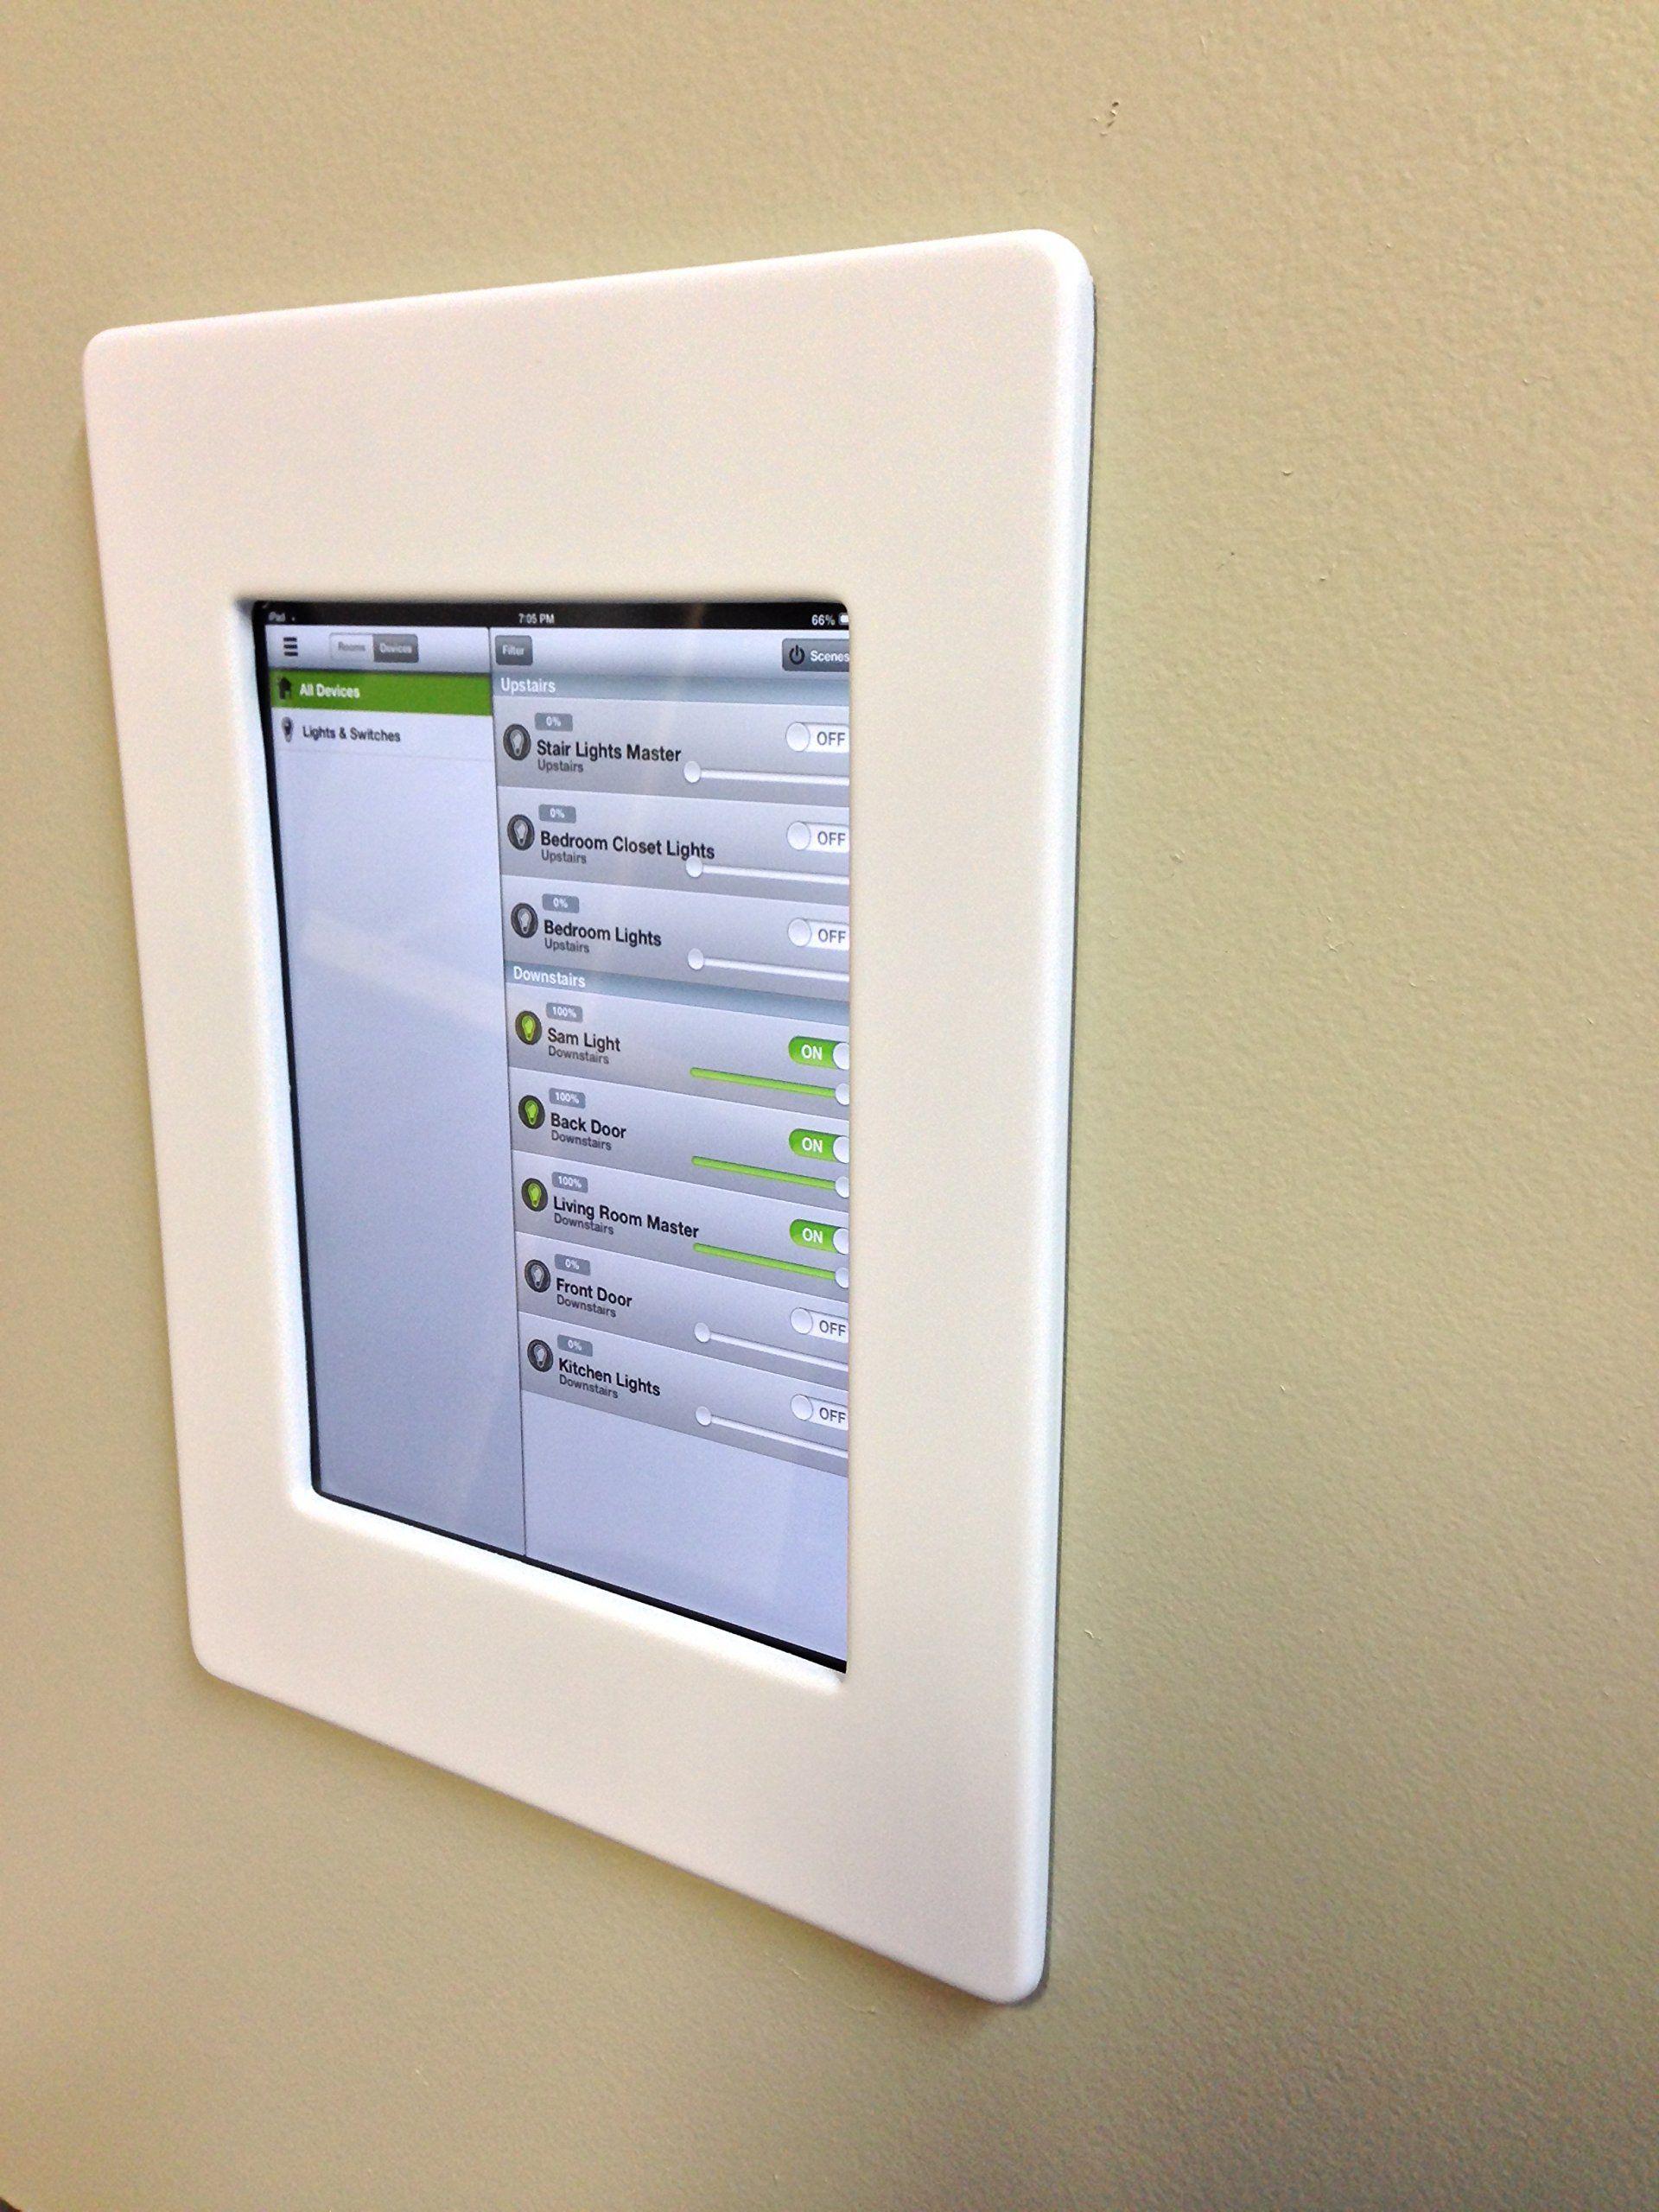 Amazon.com: iPad Mini Wall Mount - White: Computers & Accessories ...